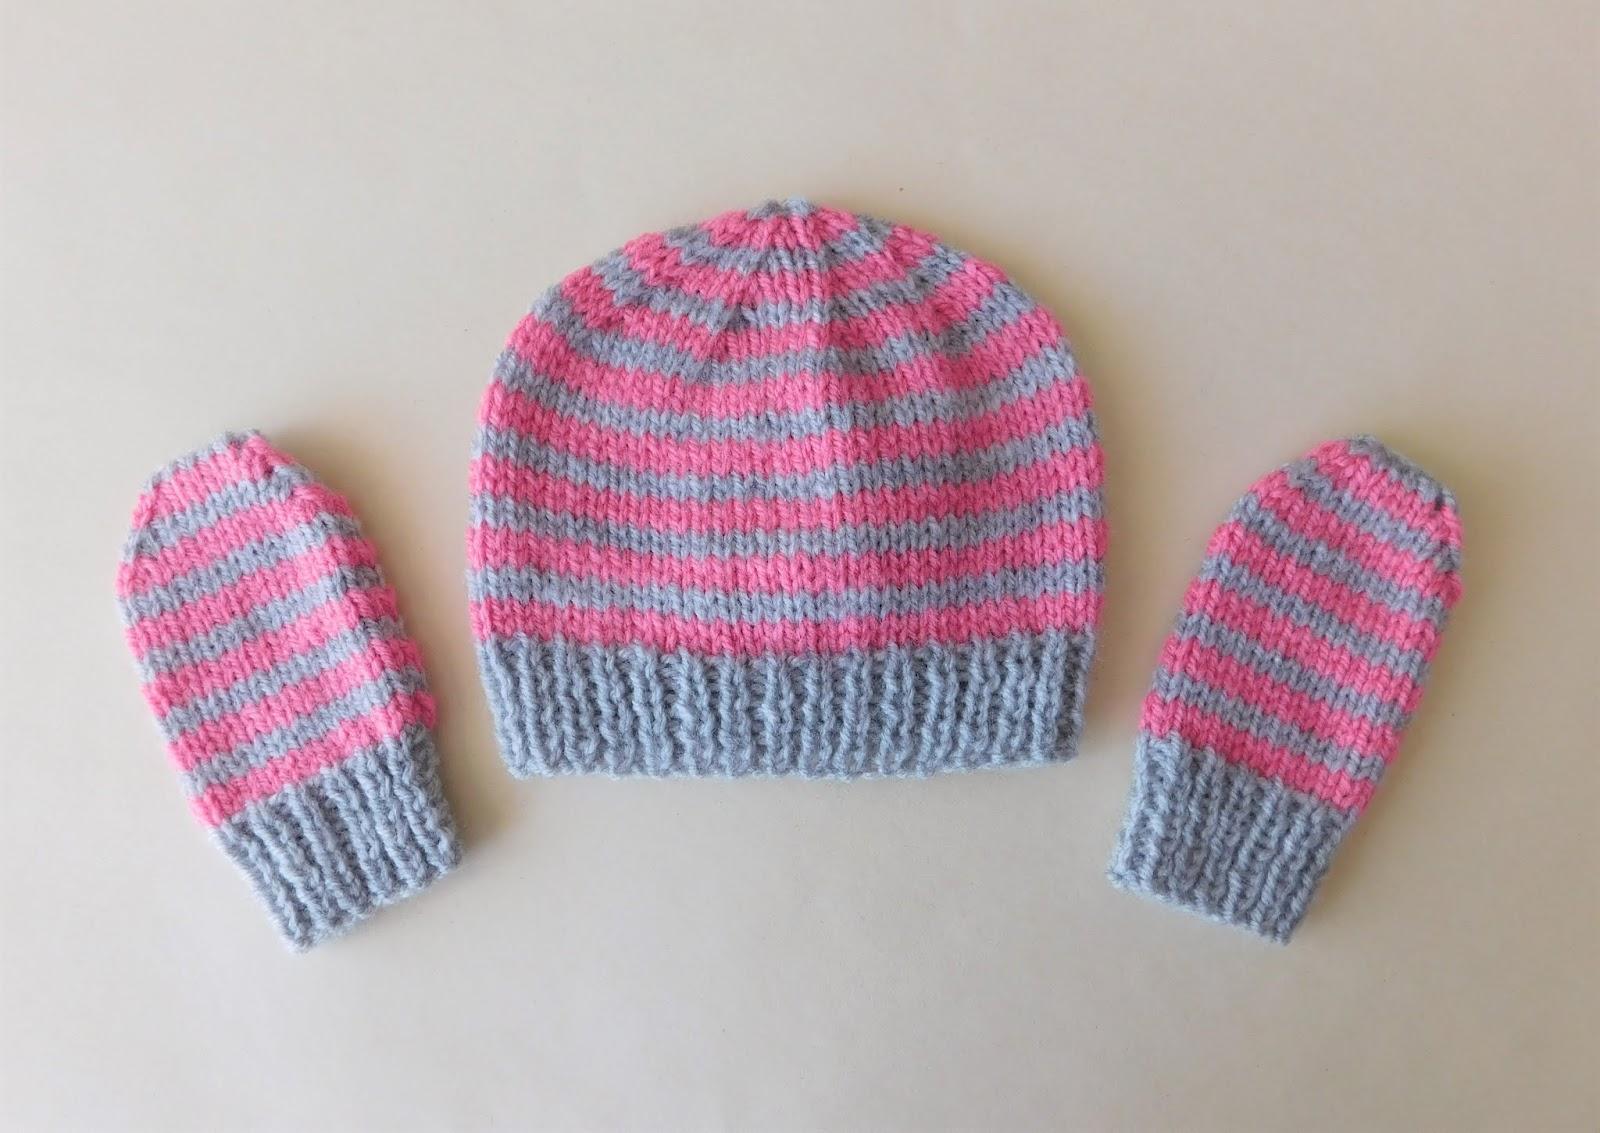 9a7ac38e Marianna's Lazy Daisy Days: Simple Stripes Baby Beanie Hat & Mittens